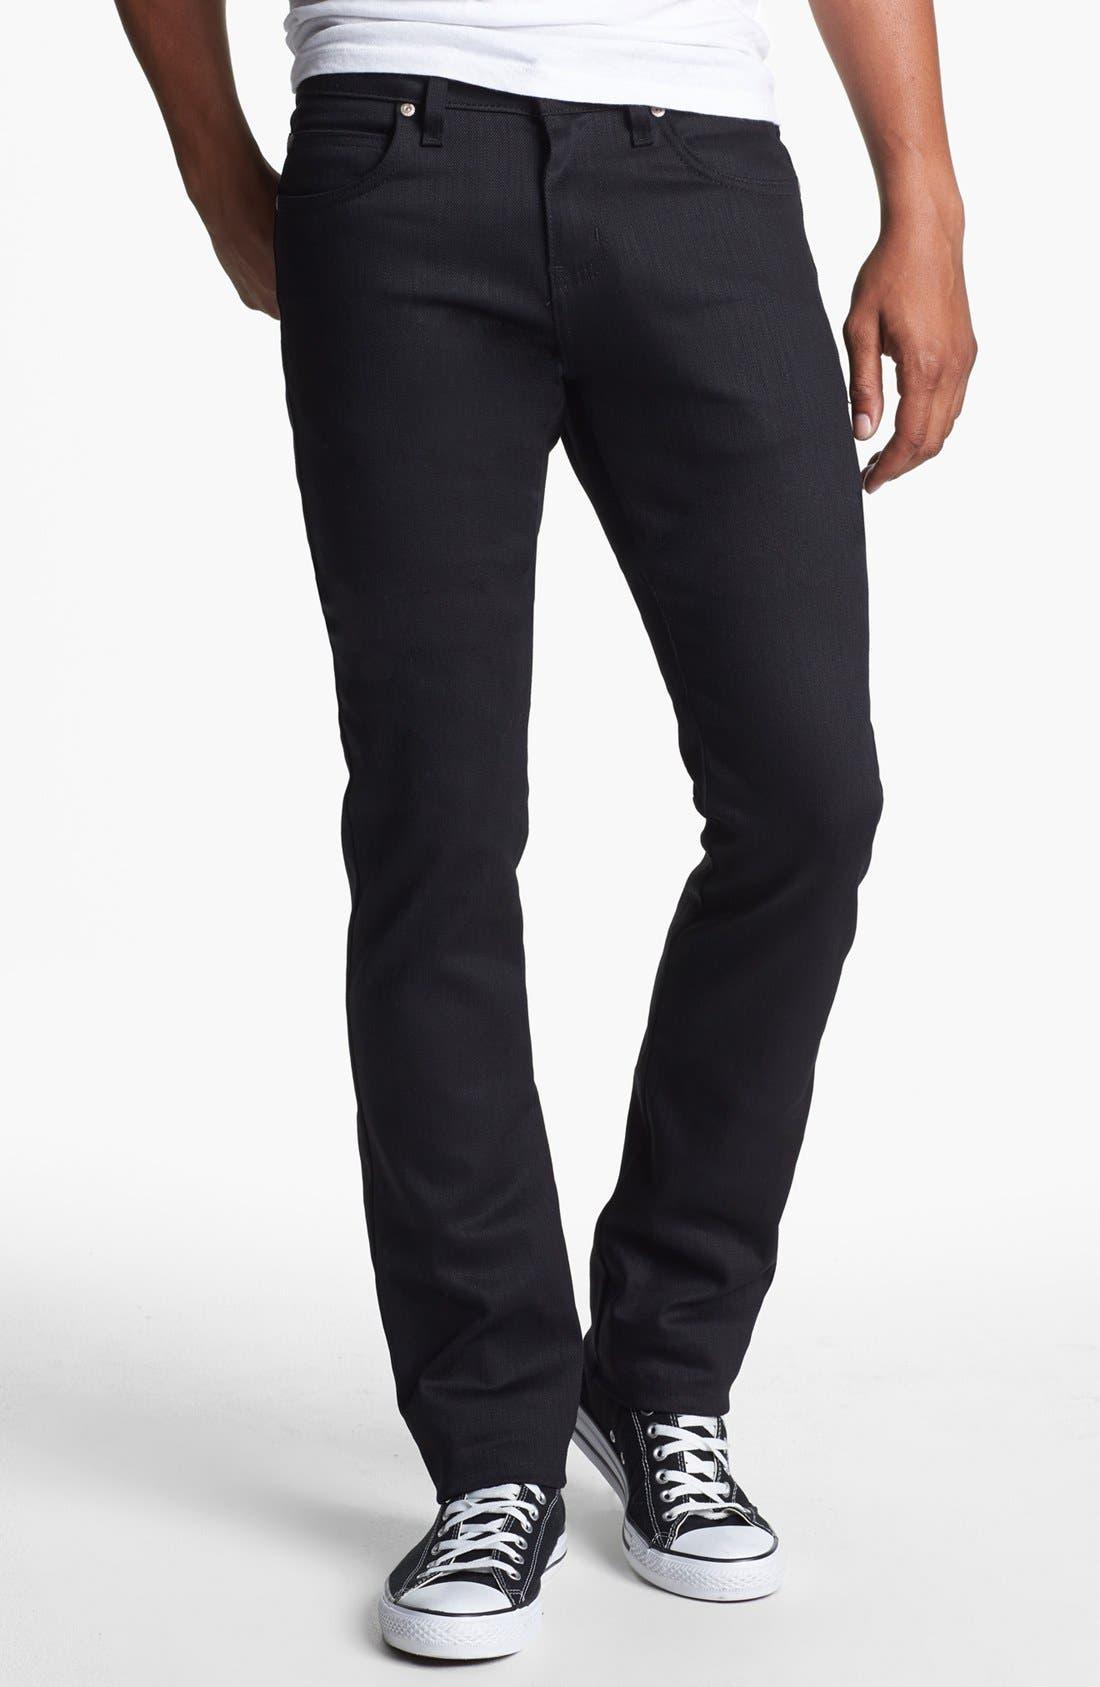 Alternate Image 1 Selected - Naked & Famous Denim Skinny Guy Skinny Fit Jeans (Black Power Stretch)